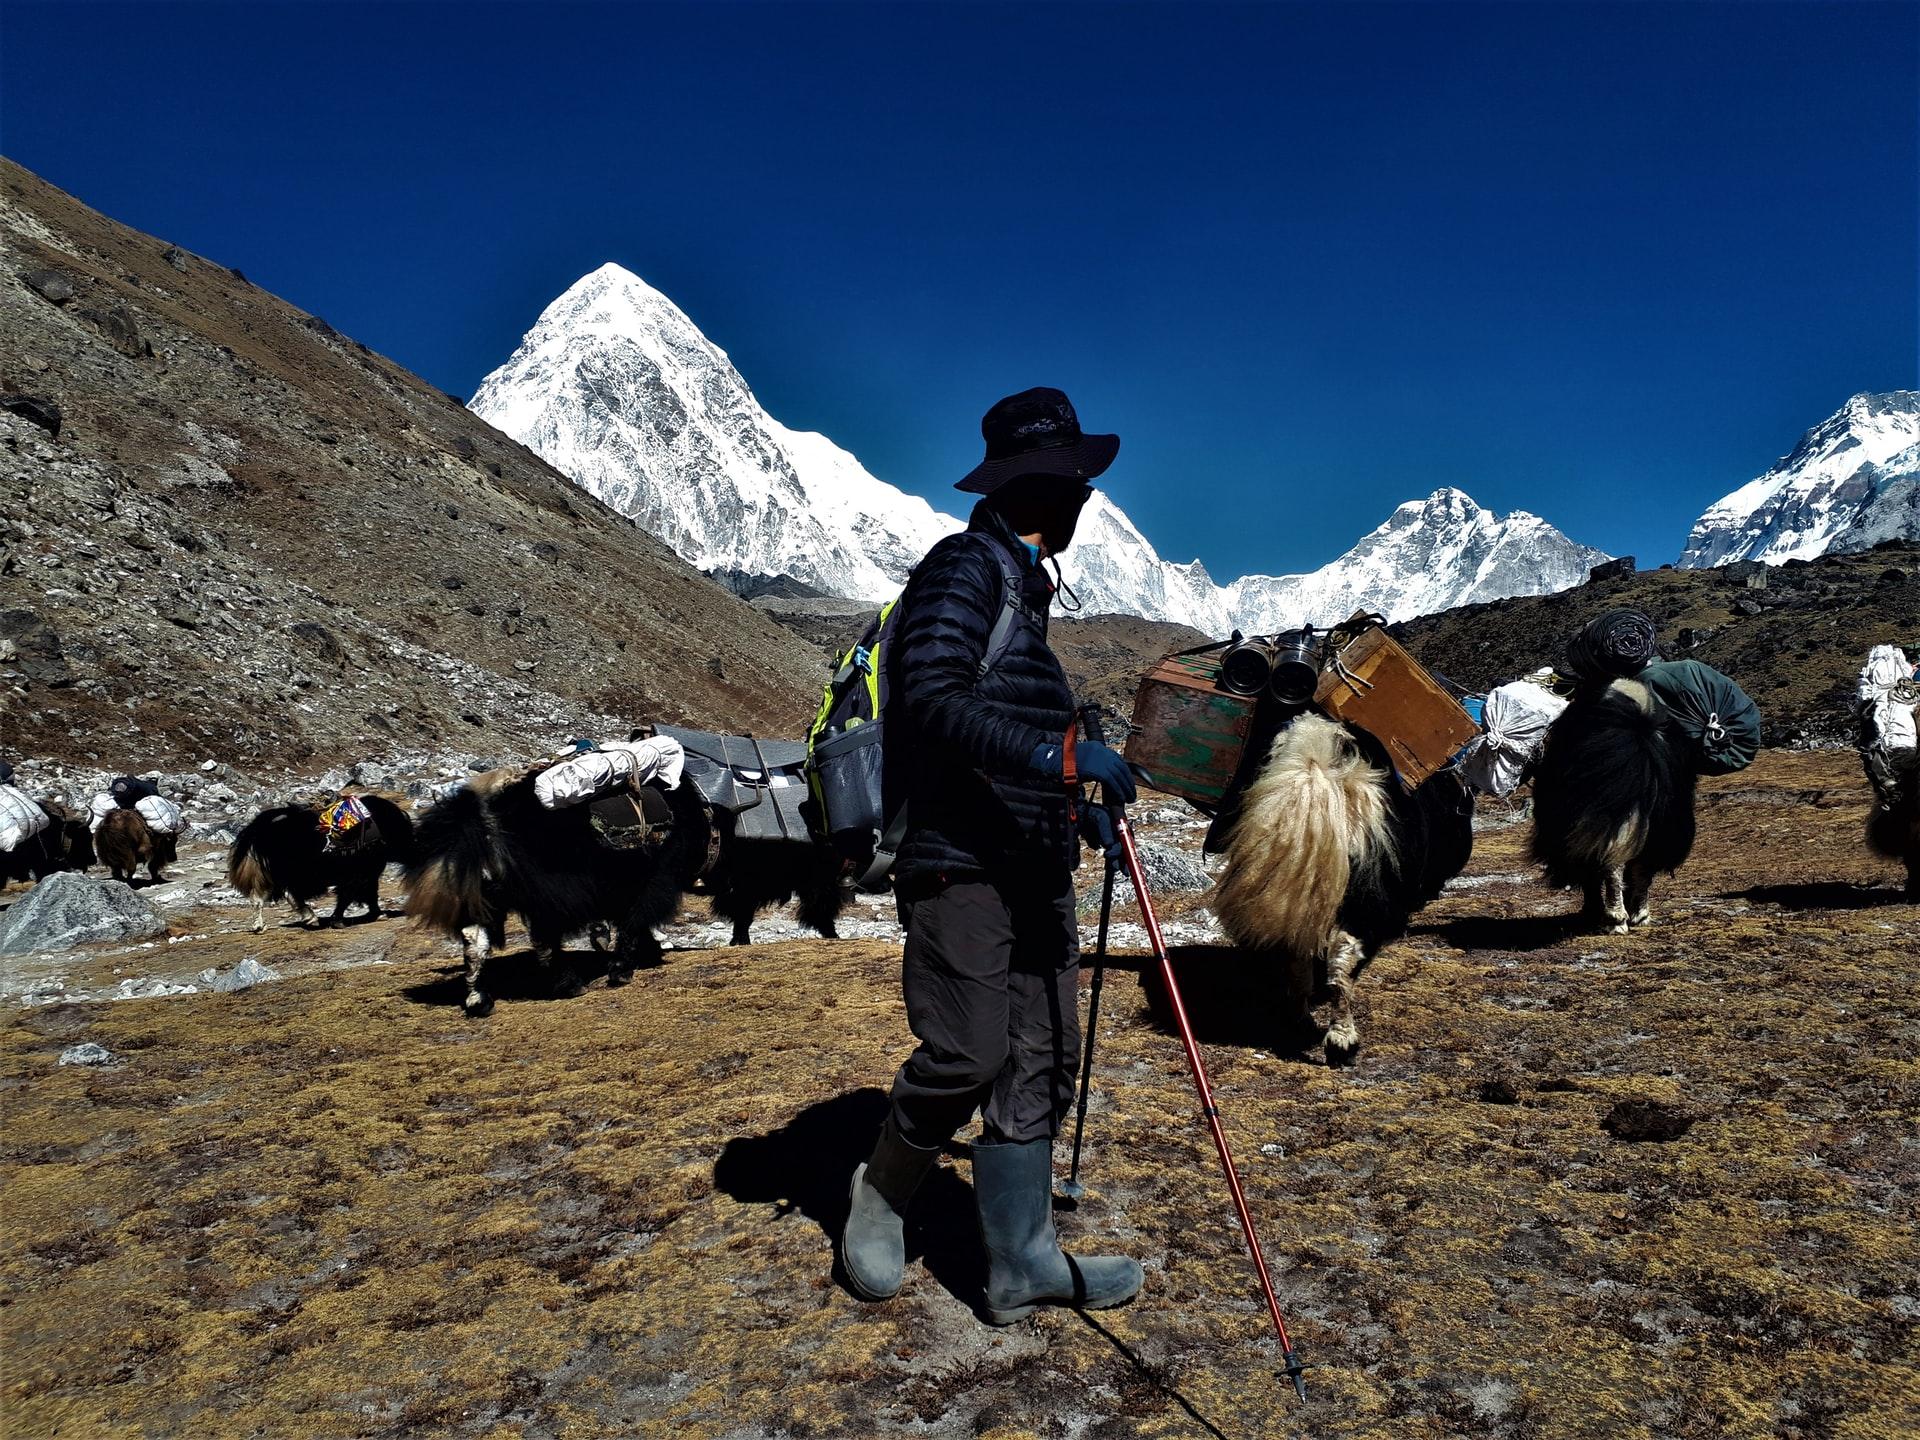 Yak ride in Himachal